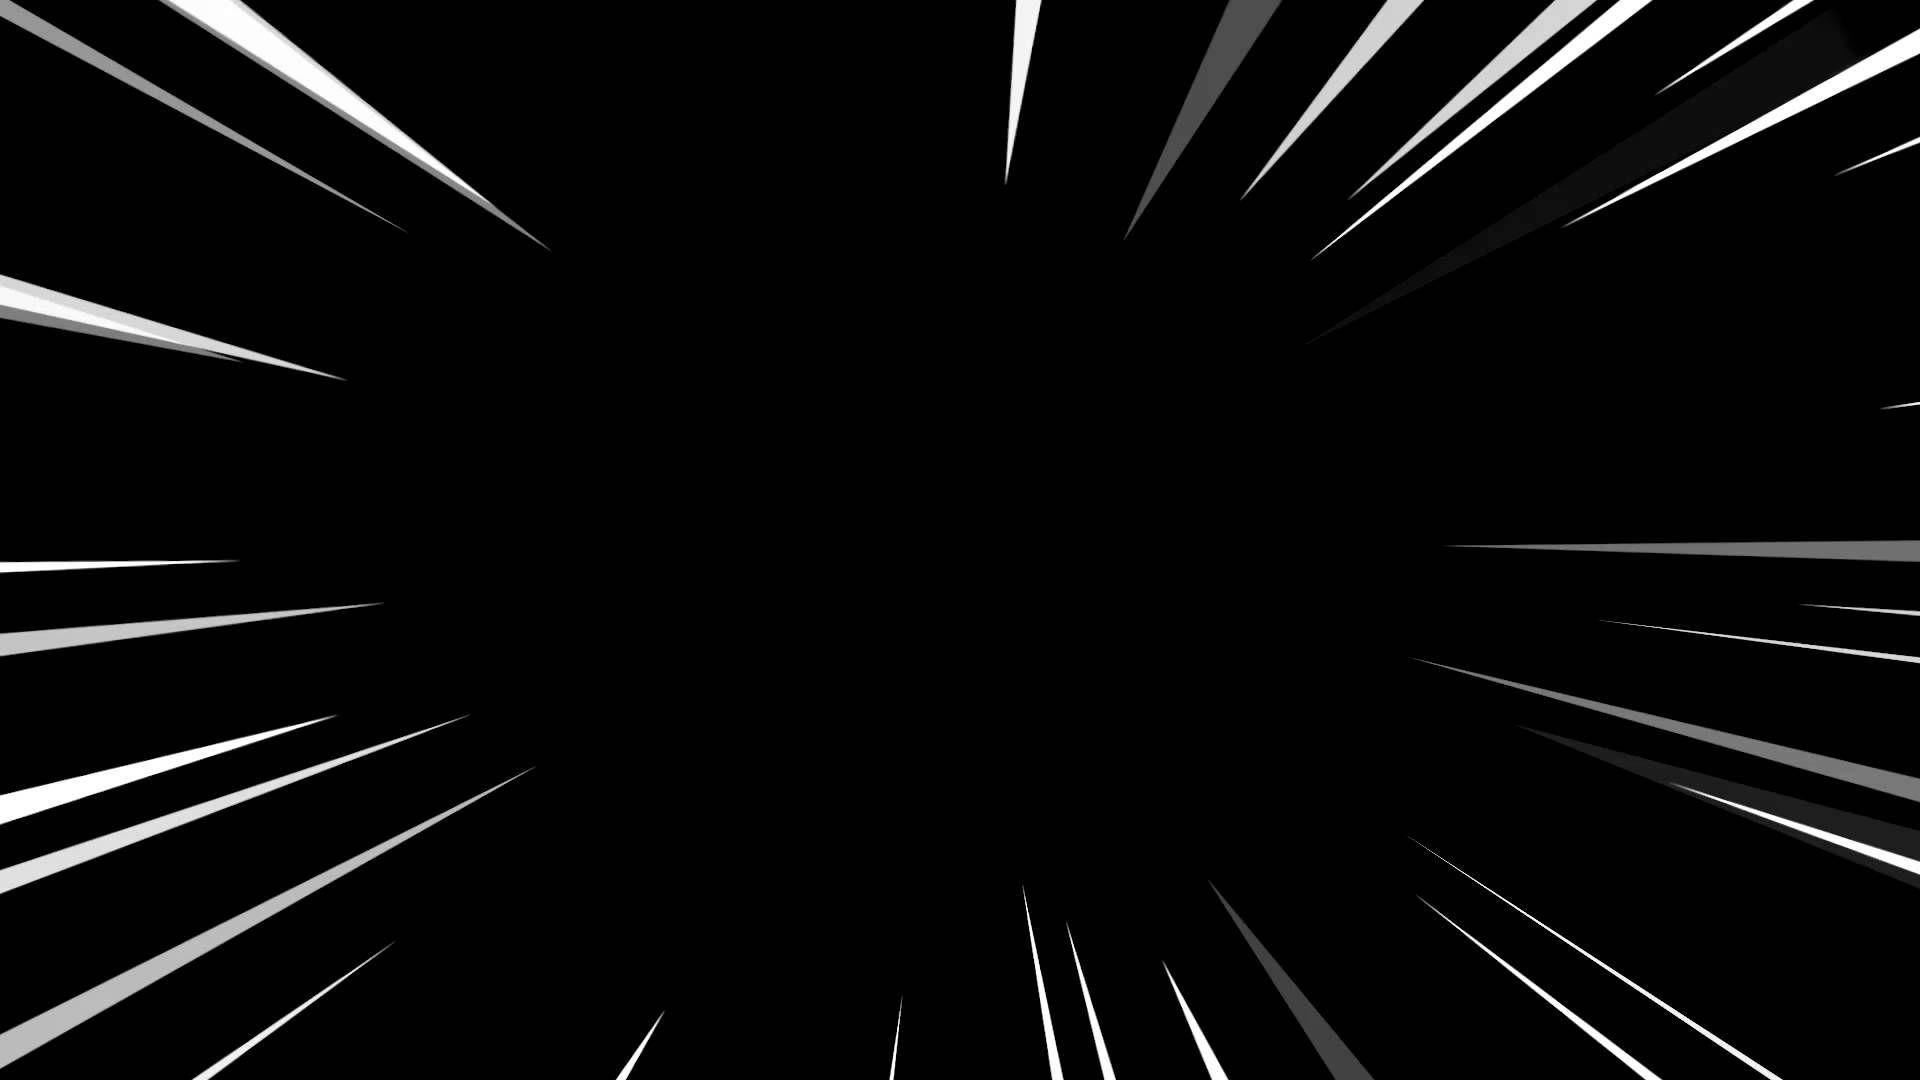 Effect Speedlines Overlay Mp4 And Pcf Download Black Backgrounds Photo Logo Design Logo Design Art